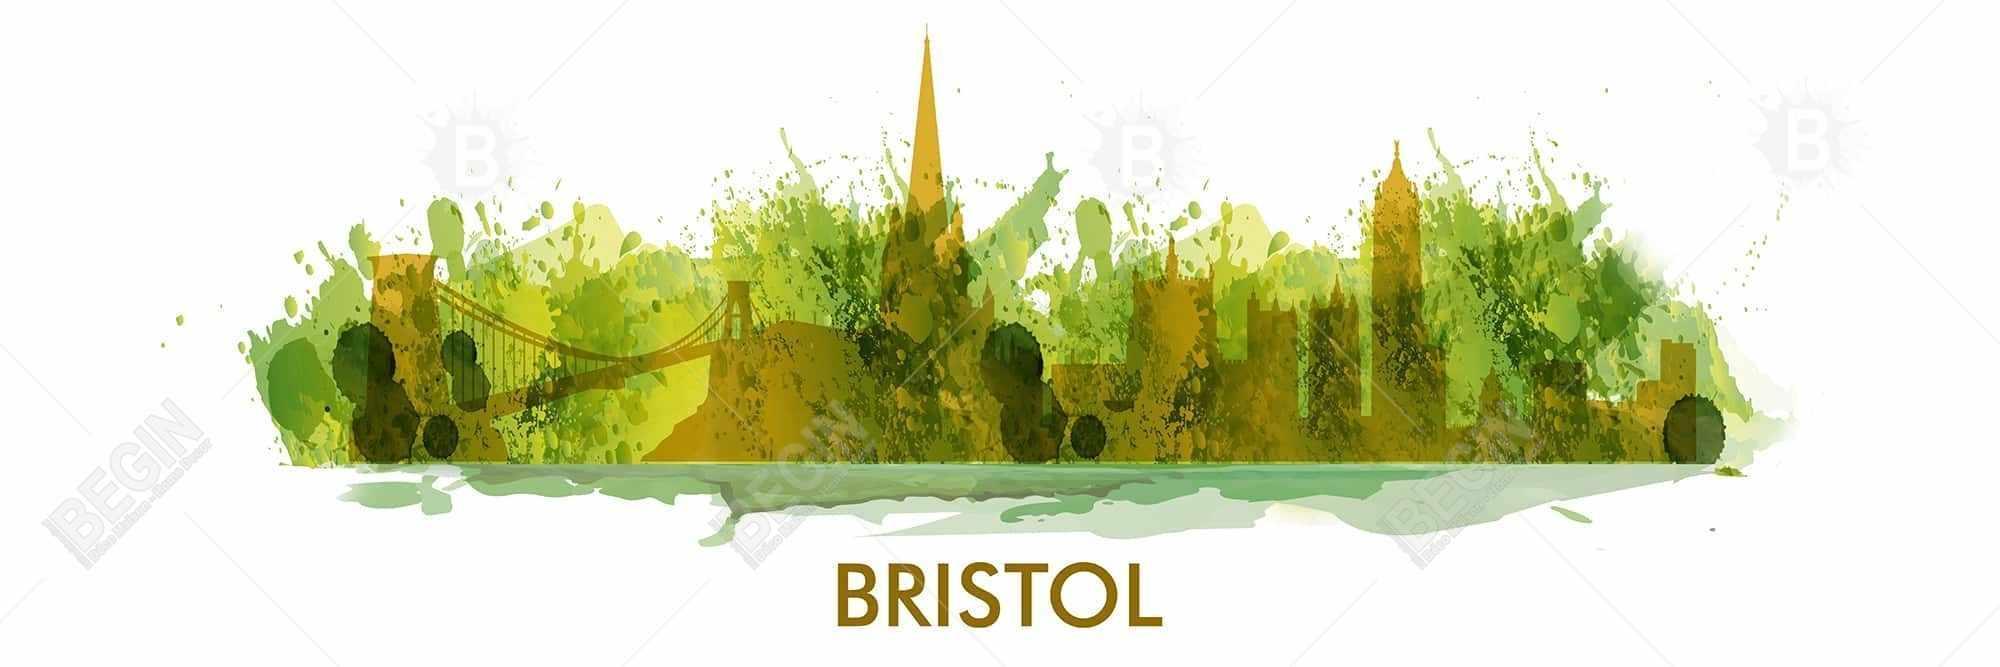 Paint splash silhouette of bristol